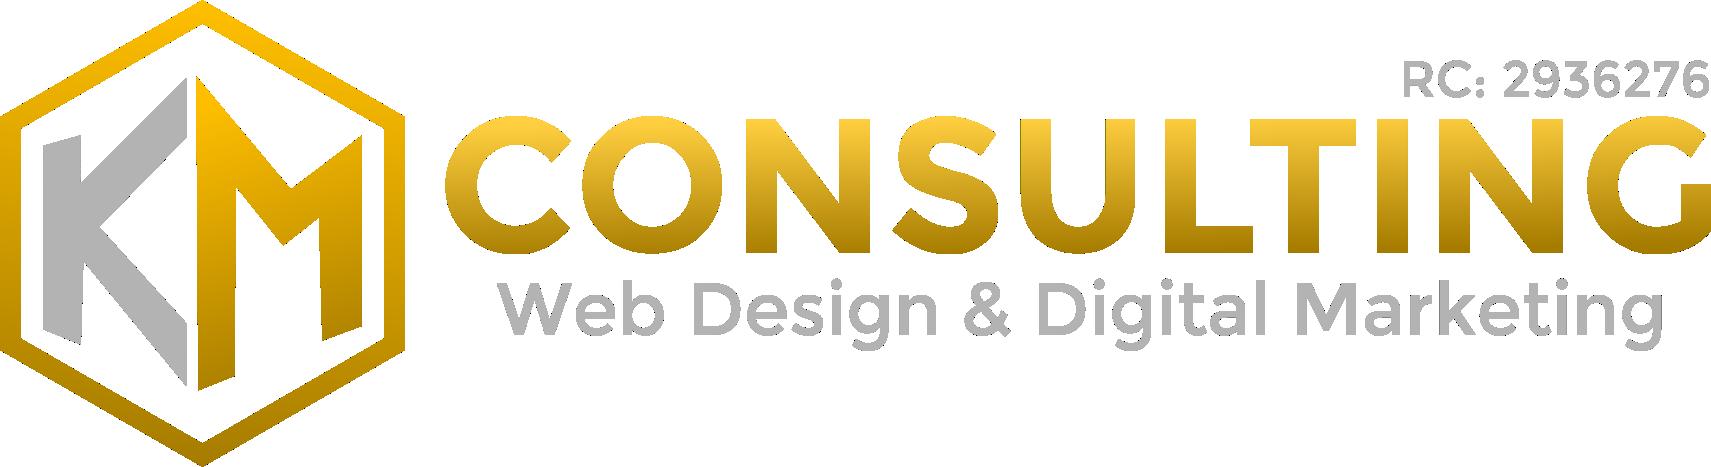 KM Consulting Nigeria Logo